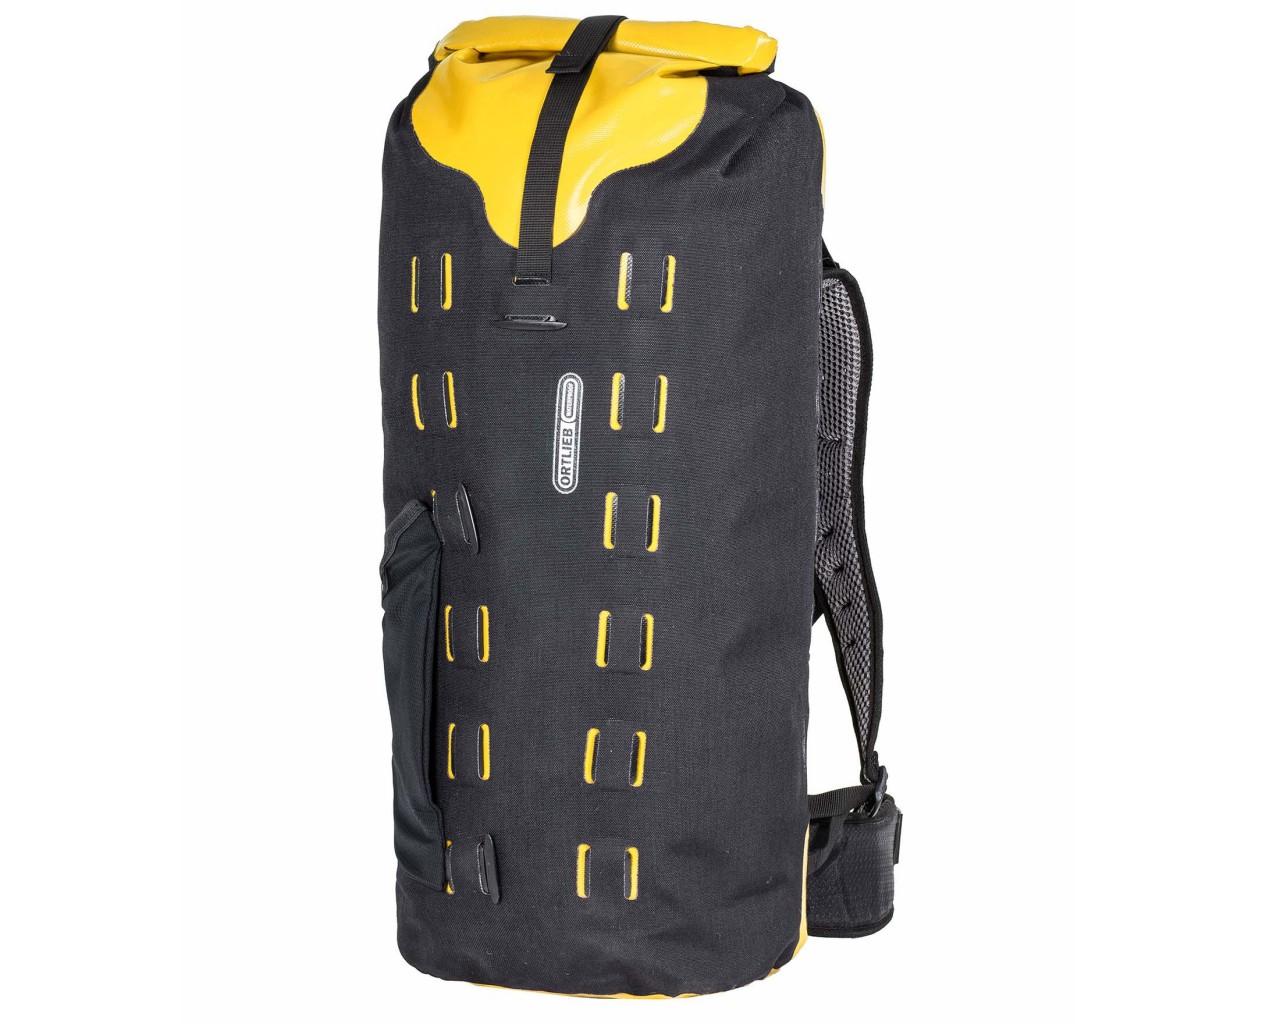 Ortlieb Gear-Pack 32 liter wasserdichter Packsack/Rucksack | black-sunyellow